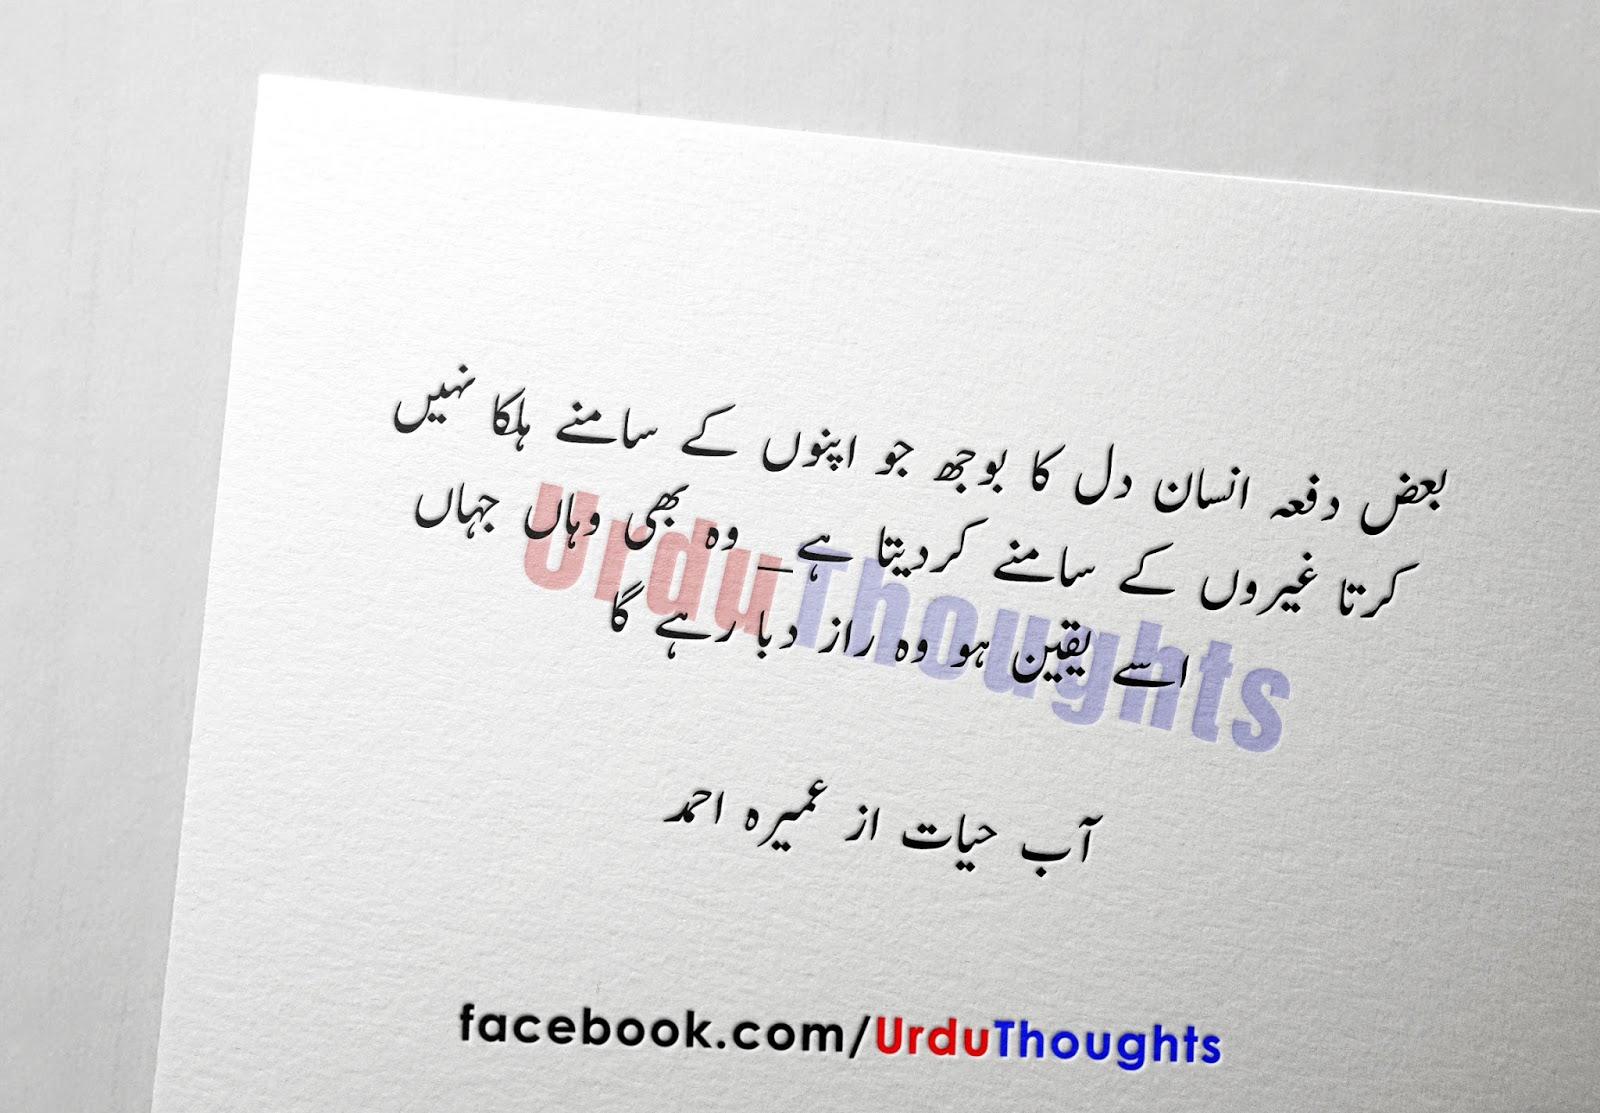 Milk And Honey Quote Wallpapers Famous Urdu Quotes Images Urdu Novels Say Iqtibas Urdu